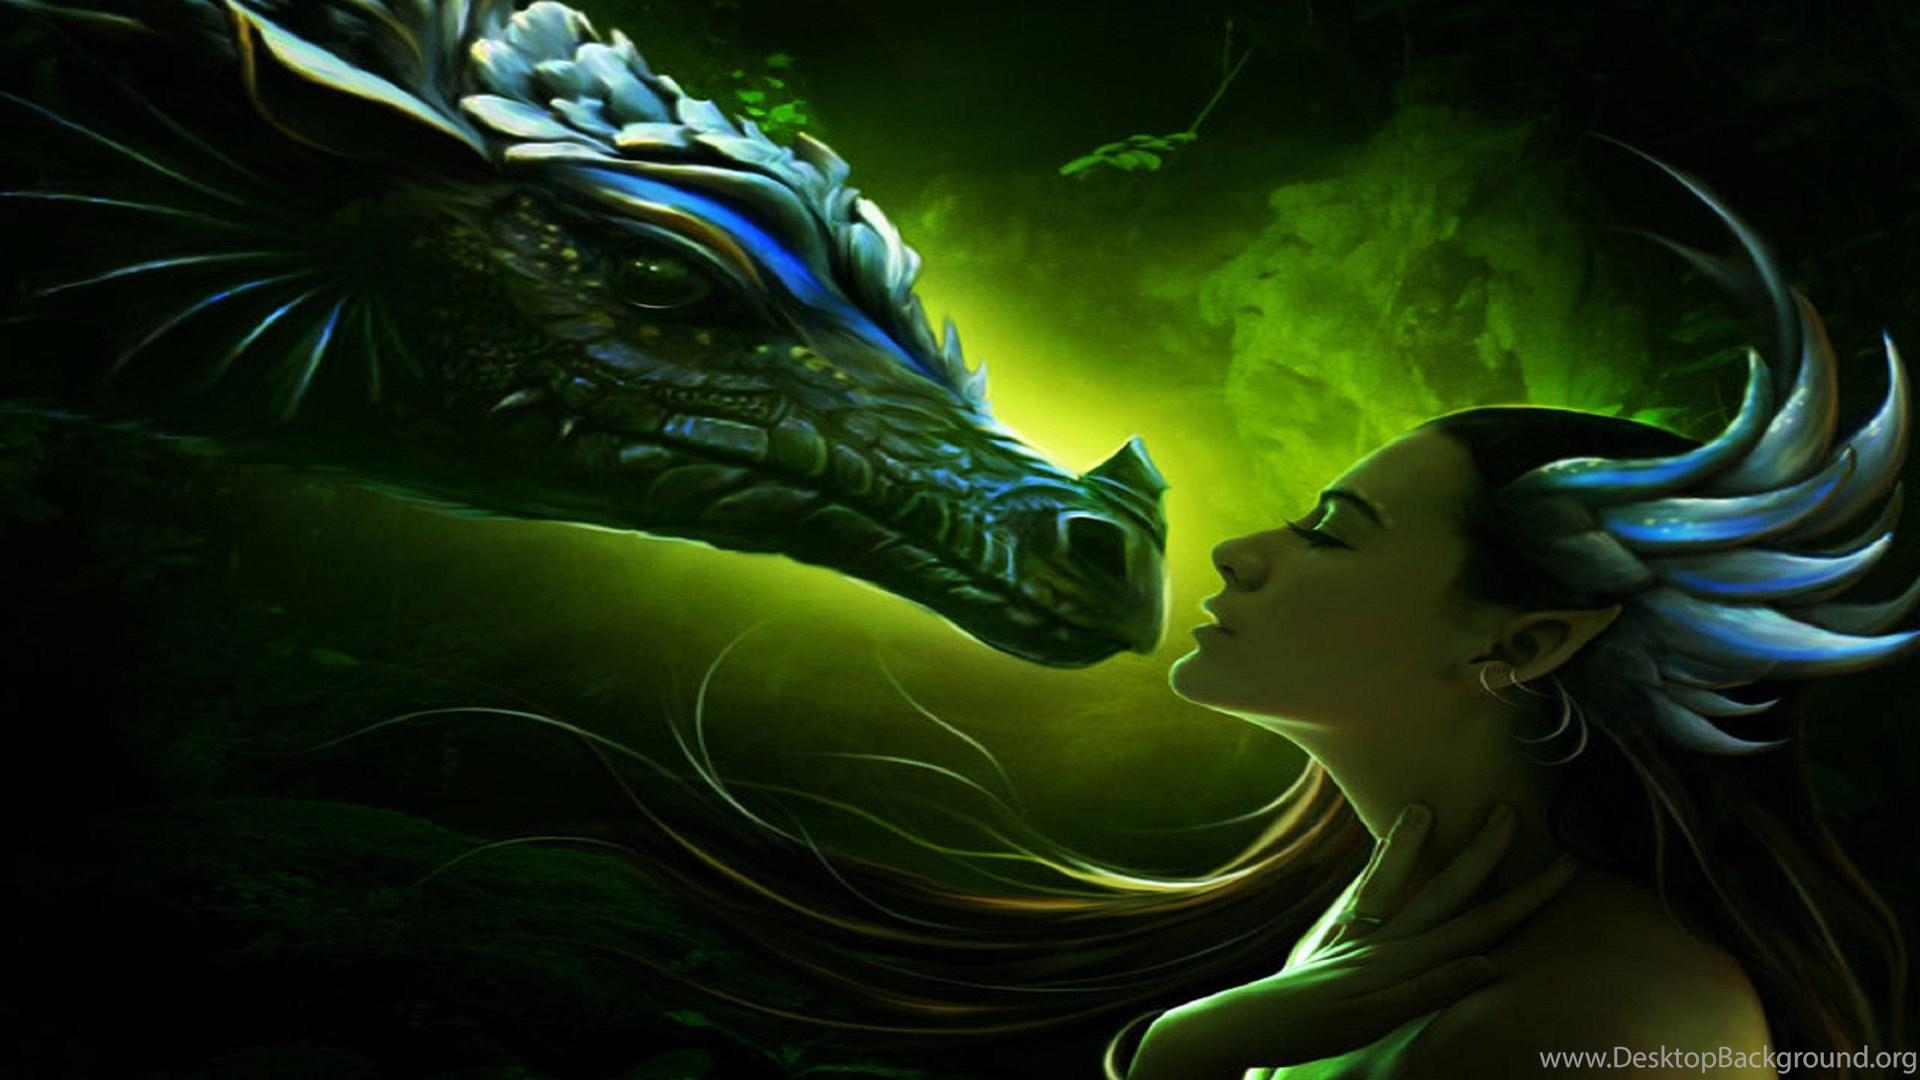 Green Dragon Desktop Background